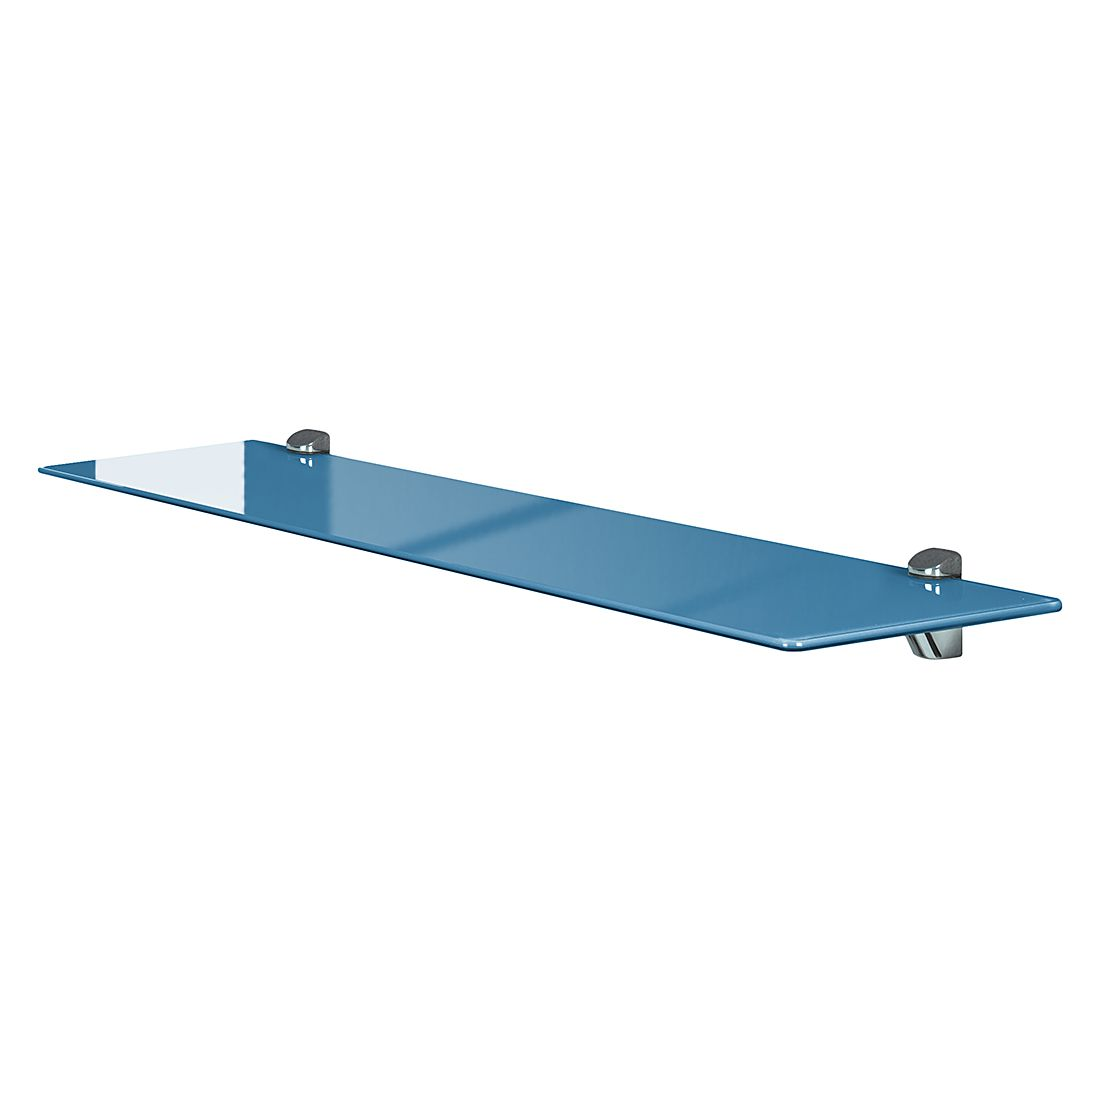 Wandboard Jopek I – Blau, mooved günstig